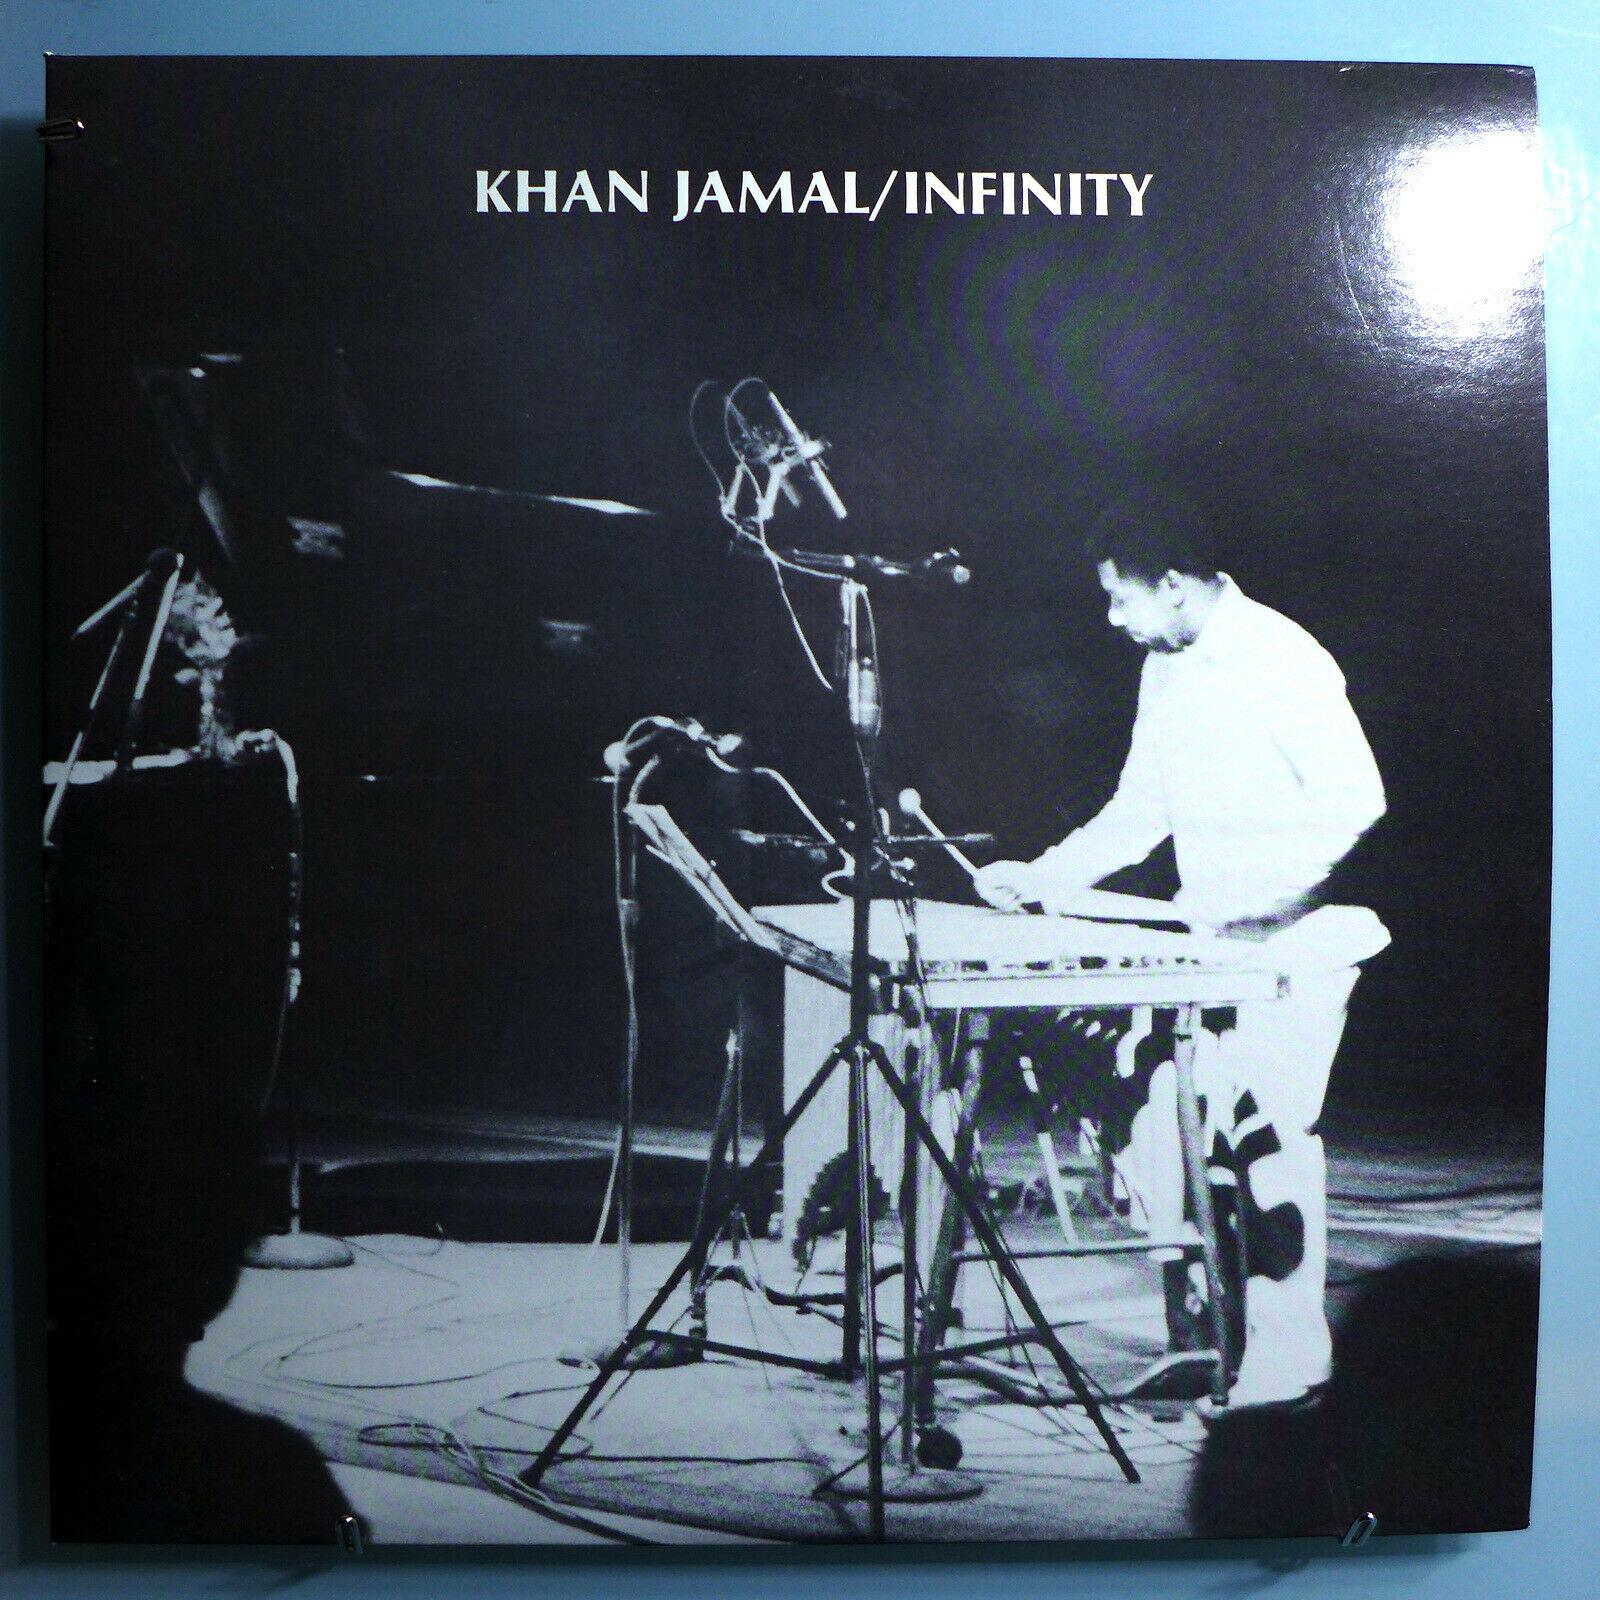 KHAN JAMAL INFINITY ULTRA RARE ORIG 84 PRIVATE PRESSING LP ON JAMBRIO LABEL MINT